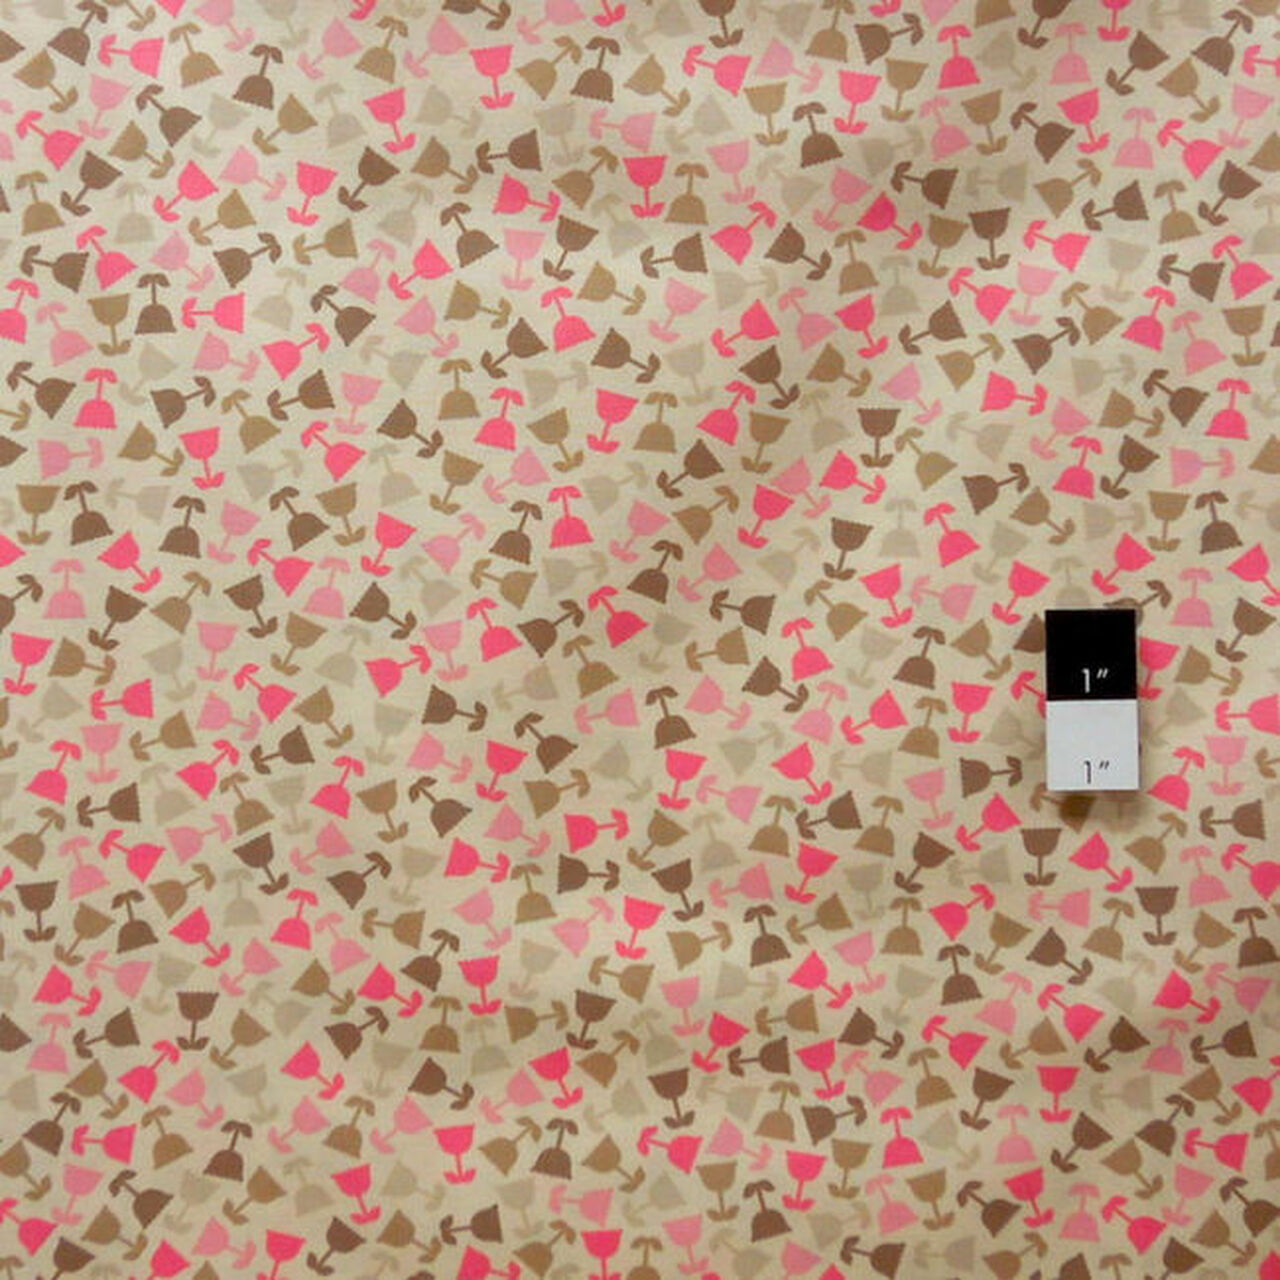 Jenean Morrison PWJM067 Grand Hotel Rooftop Garden Pink Fabric By Yd